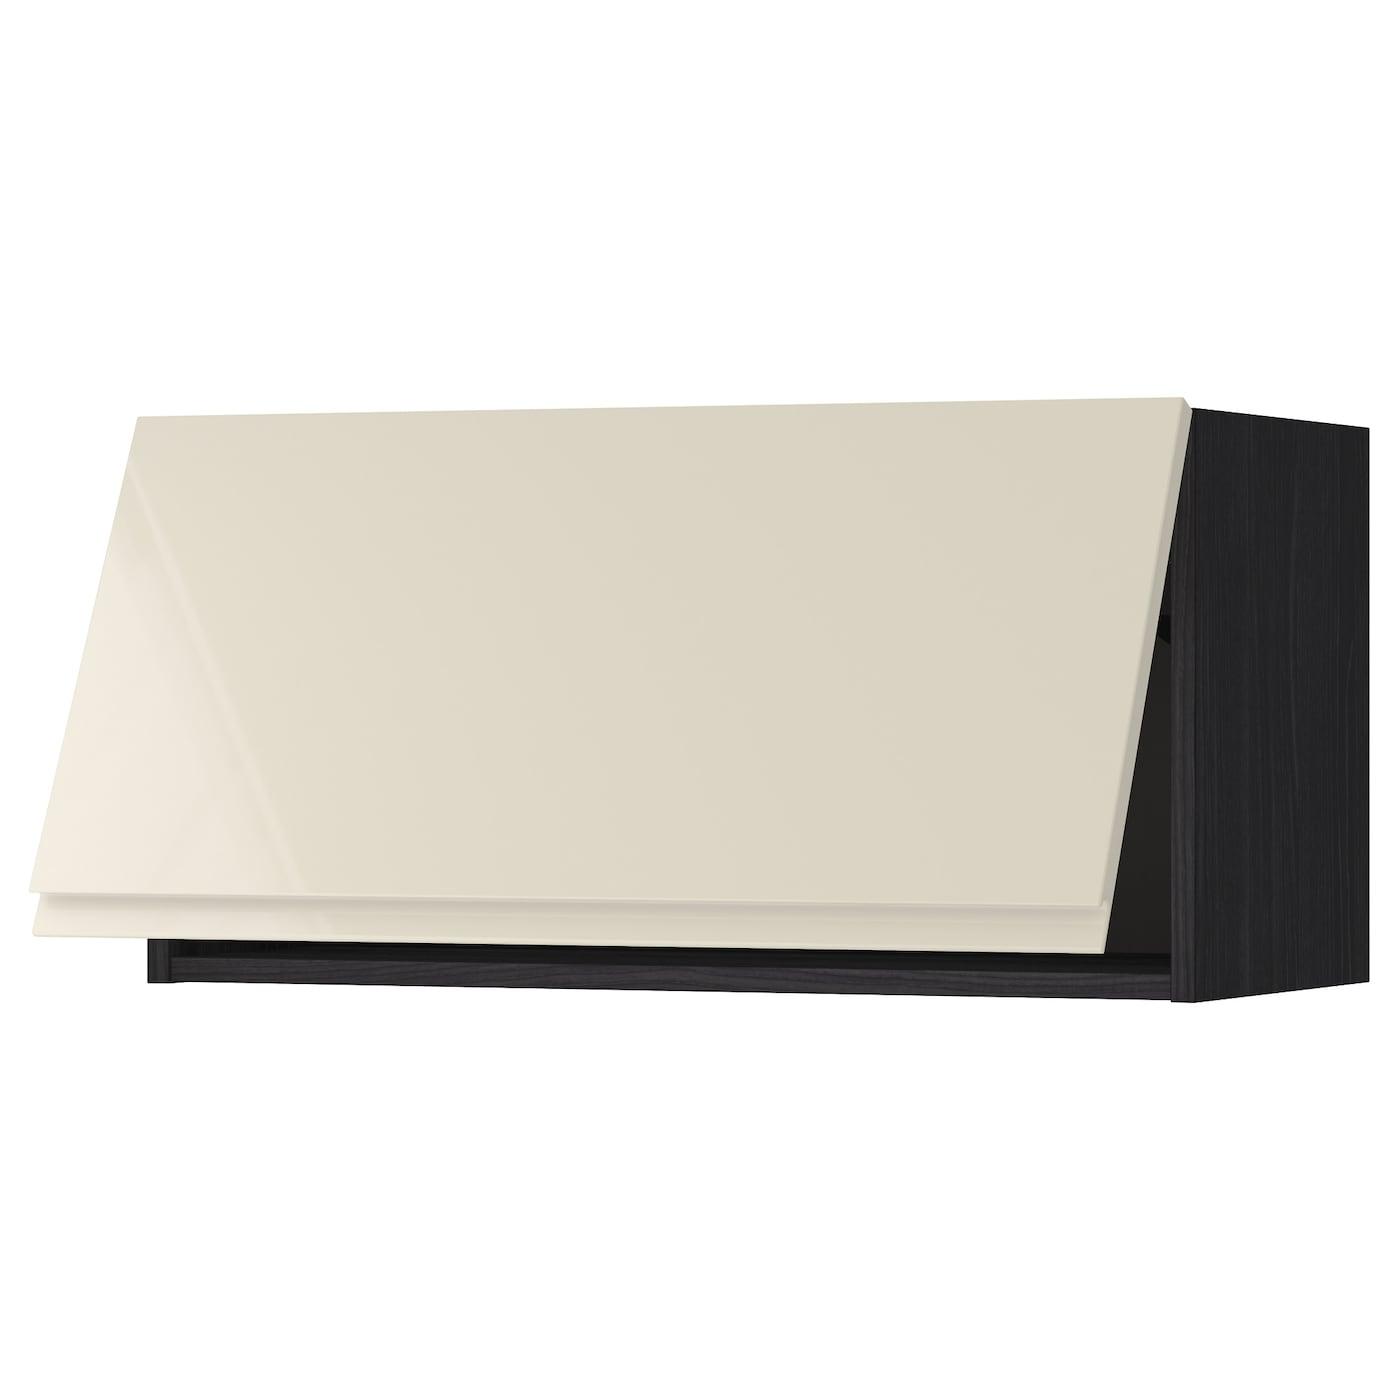 METOD, Wandschrank horizontal, schwarz 191.432.35